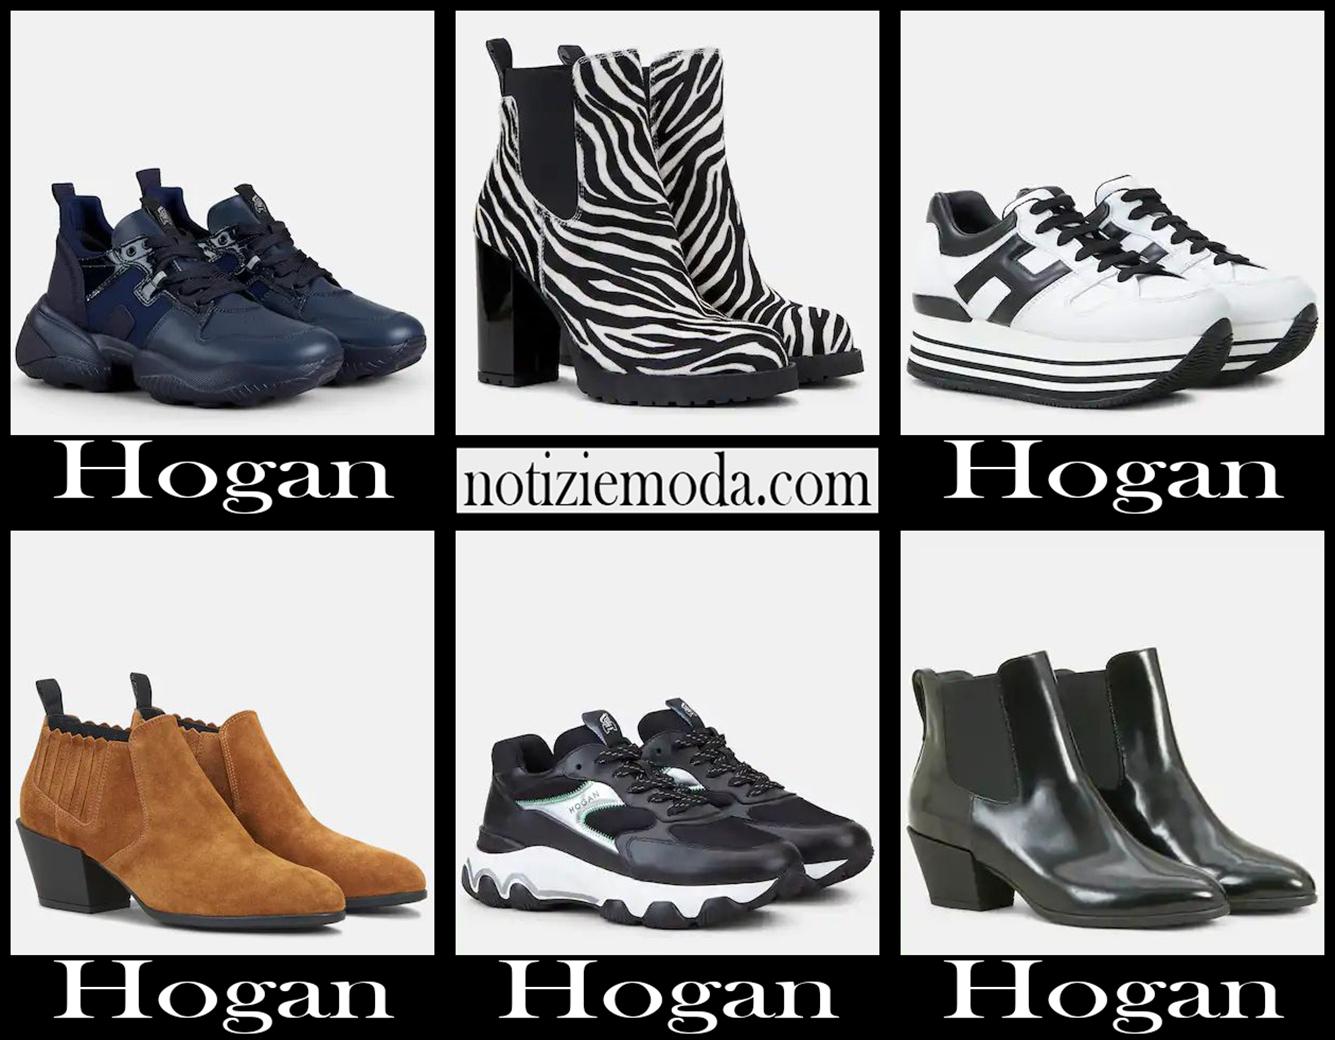 Scarpe Hogan 20-2021 autunno inverno moda donna